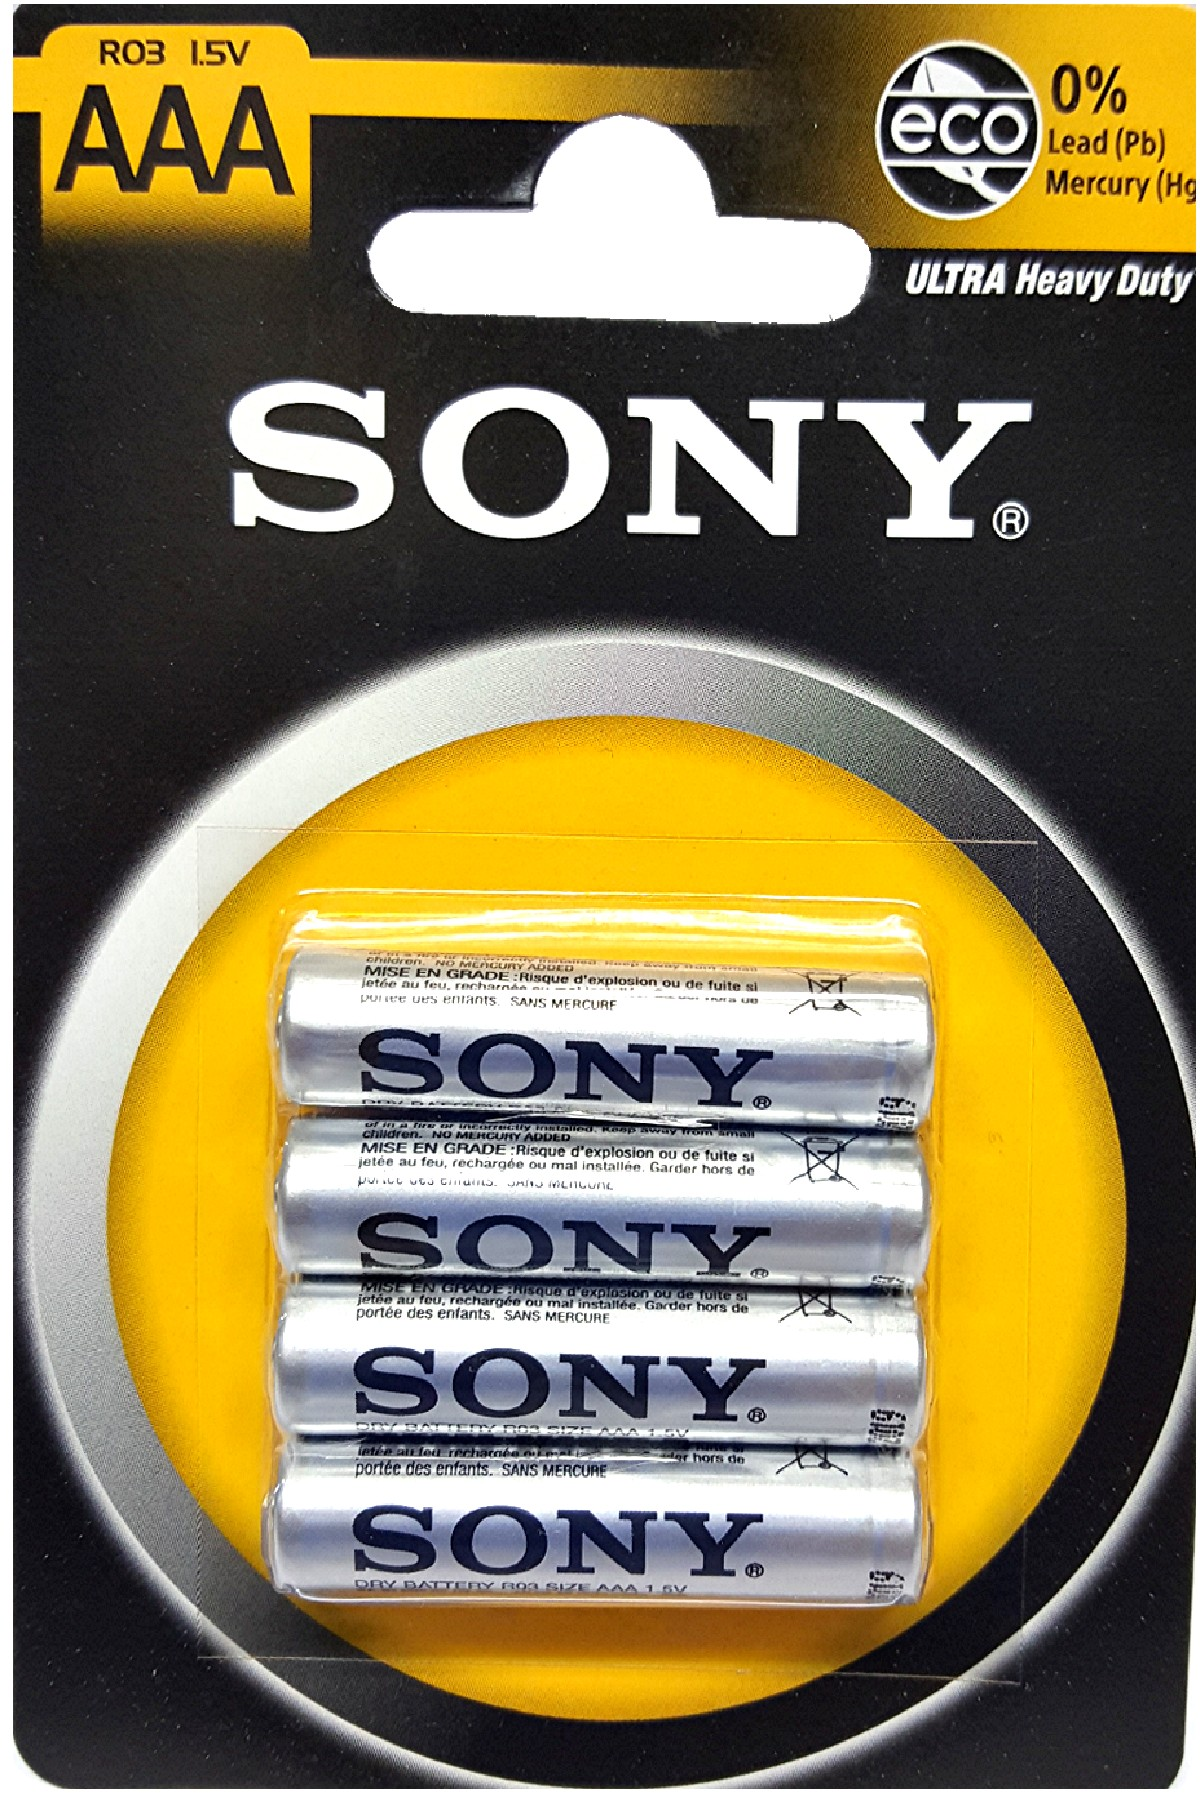 4 Piles 1.5v / AAA  R03  Sony